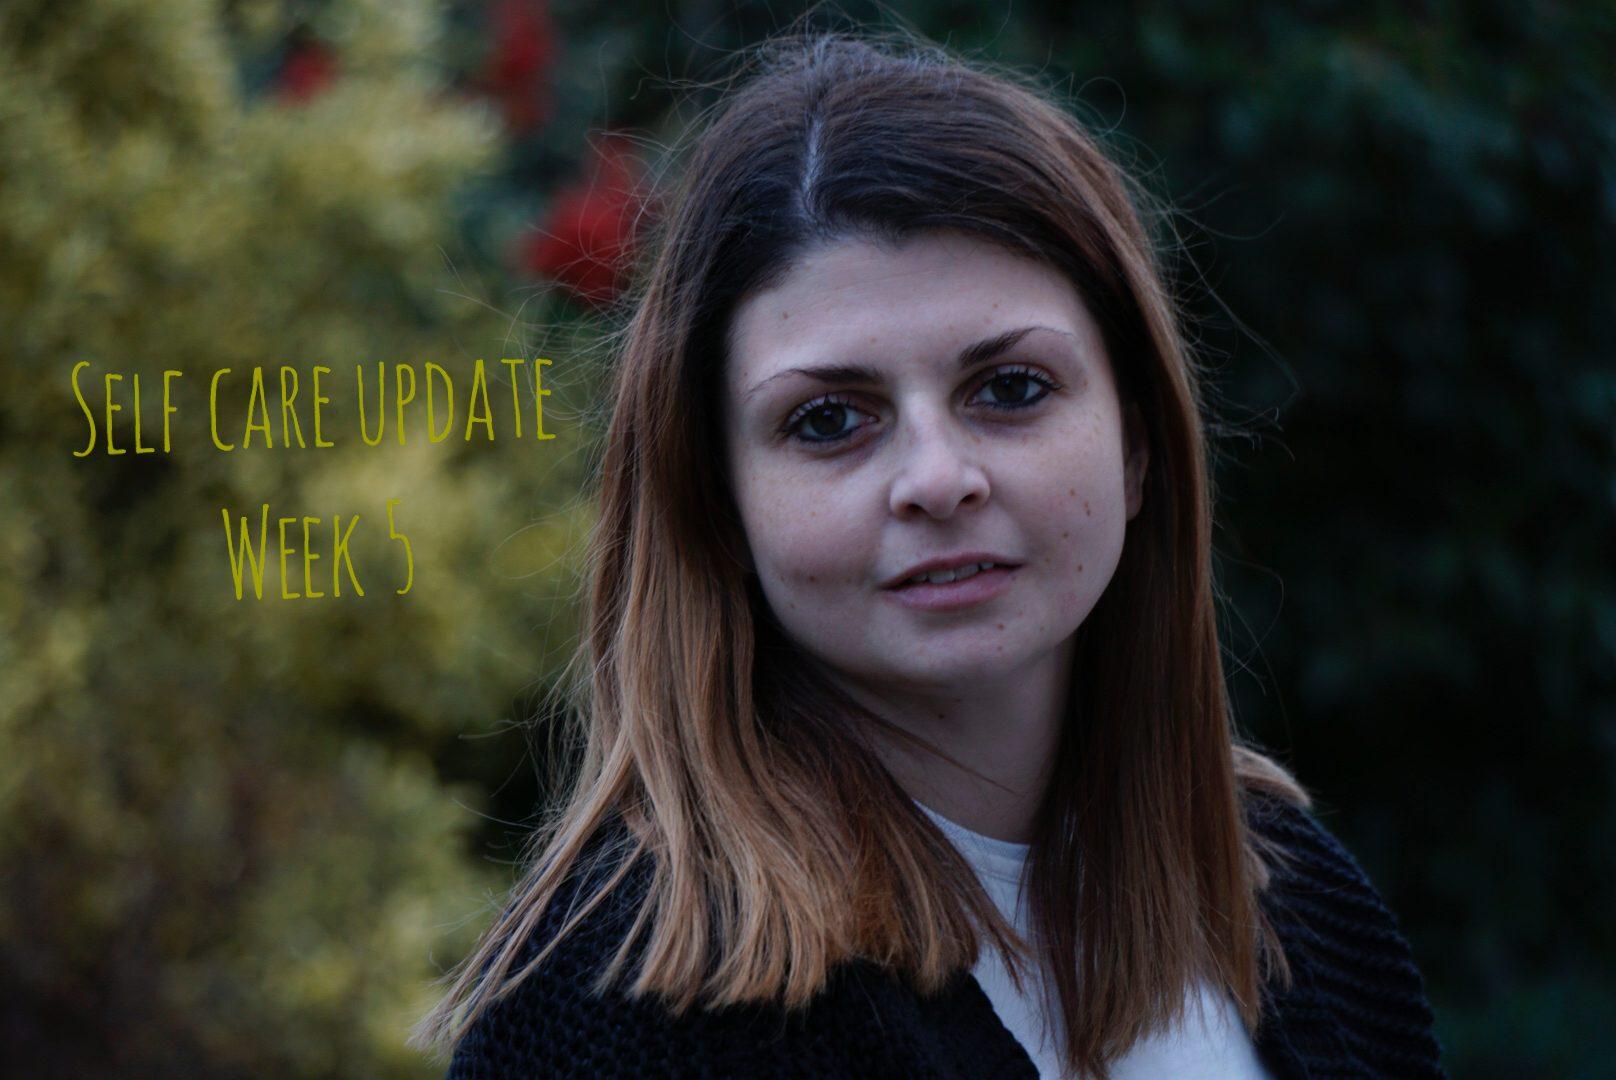 Self Care Update – Week 5 graphic